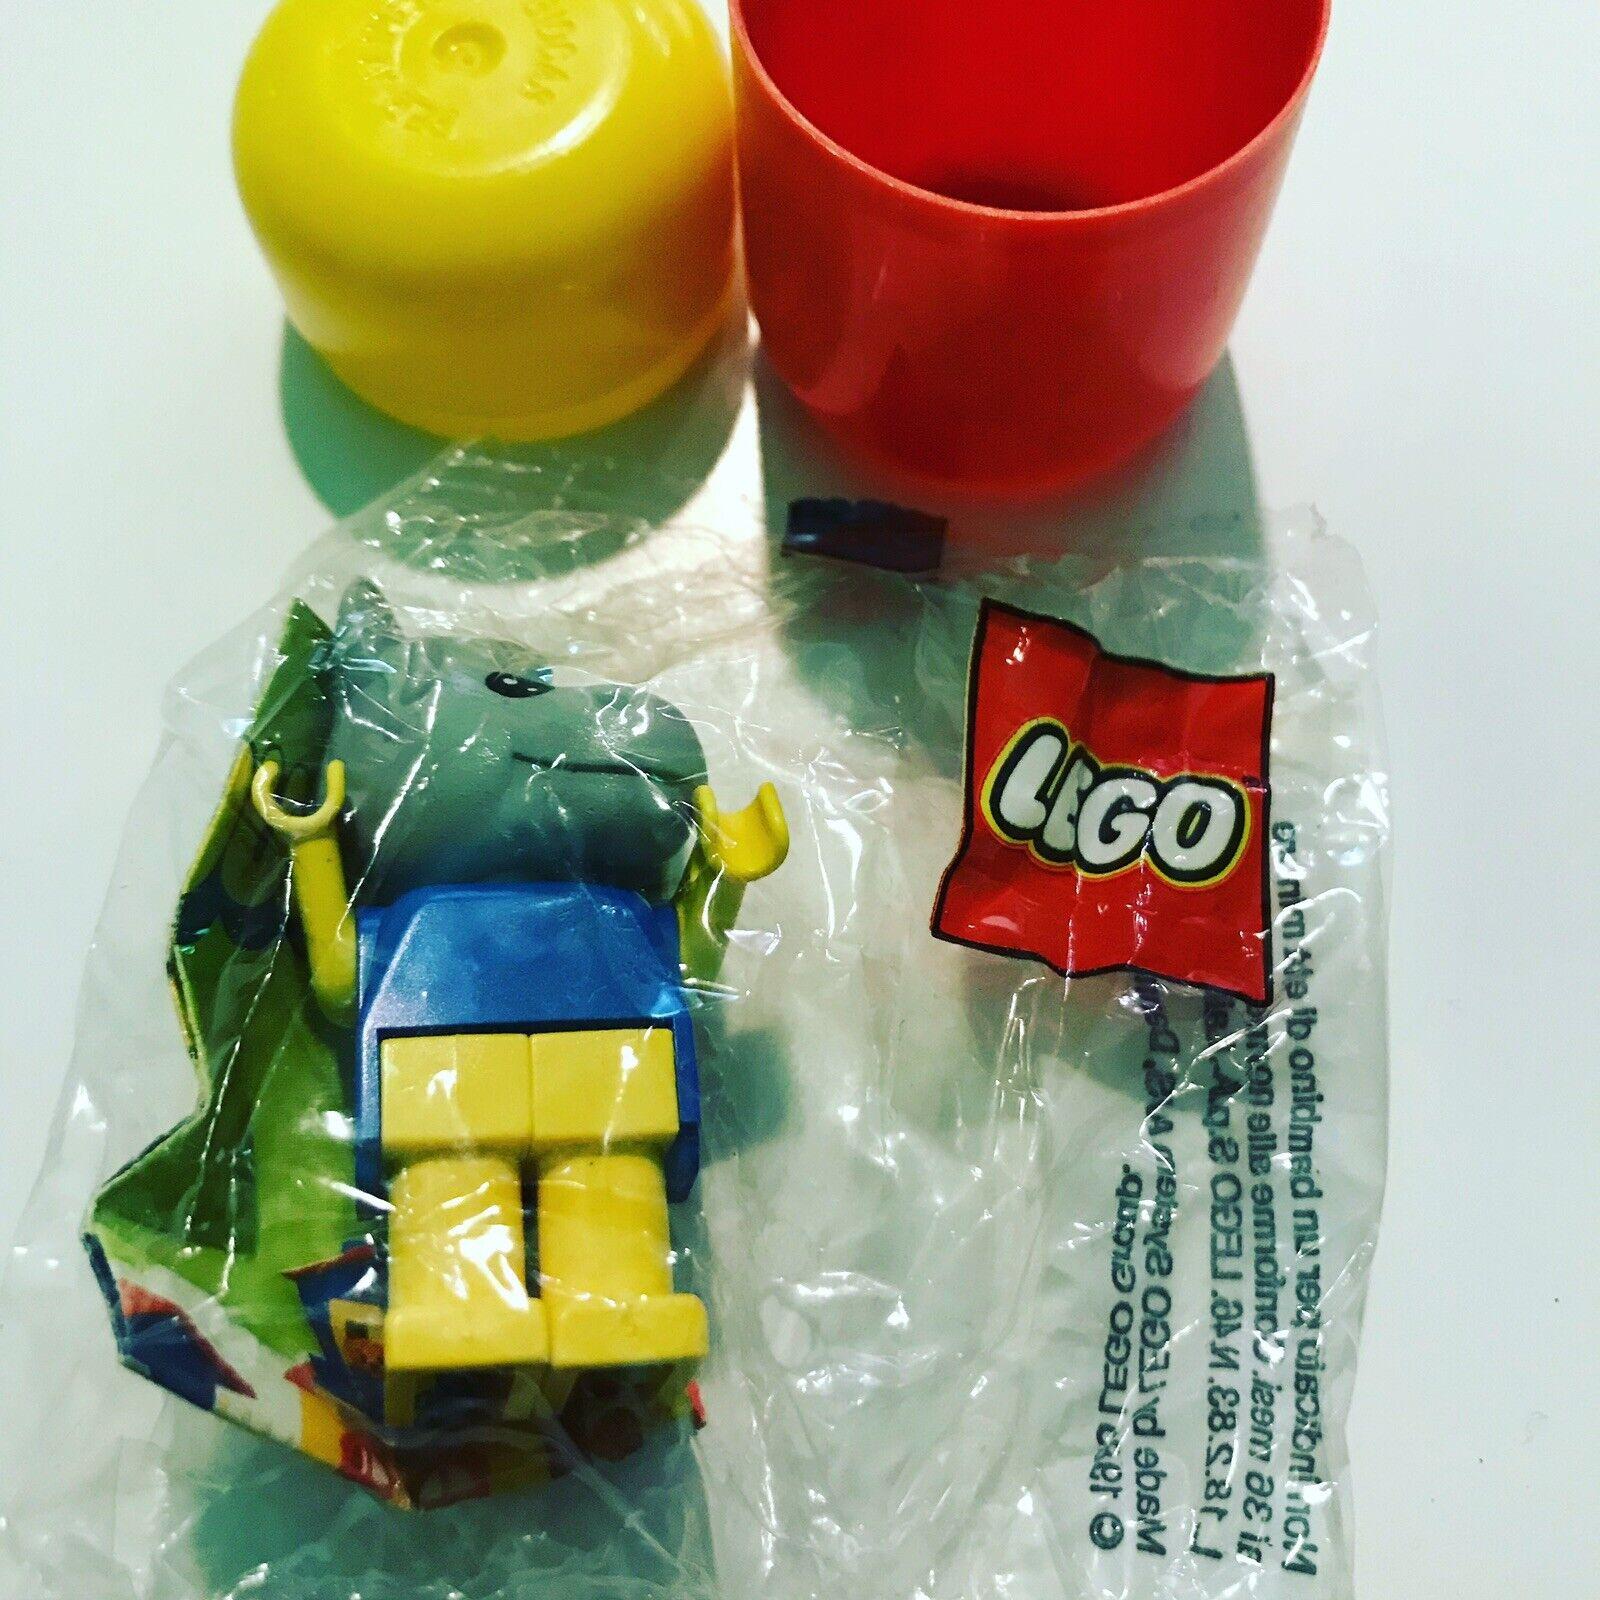 LEGO Vintage Special Fabuland OrzGold Chocolate Nestle Gift 1985 sealed misb